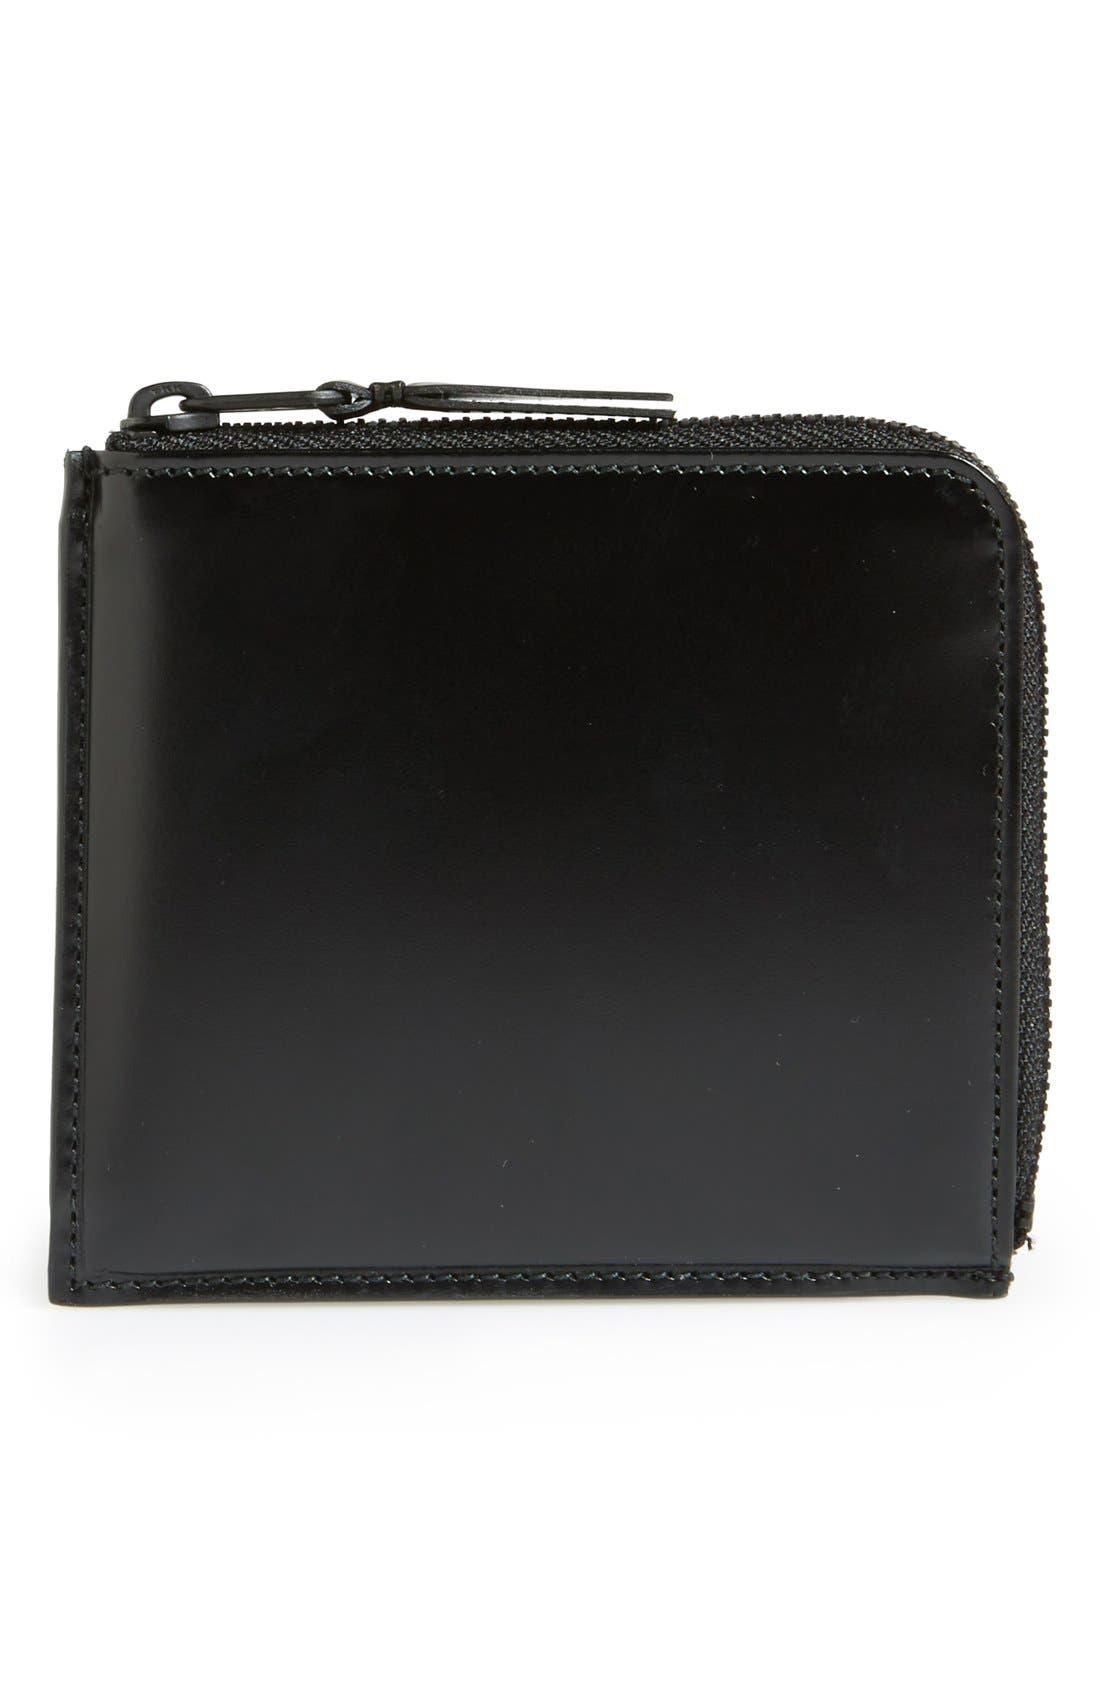 Comme des Garçons Half Zip French Wallet